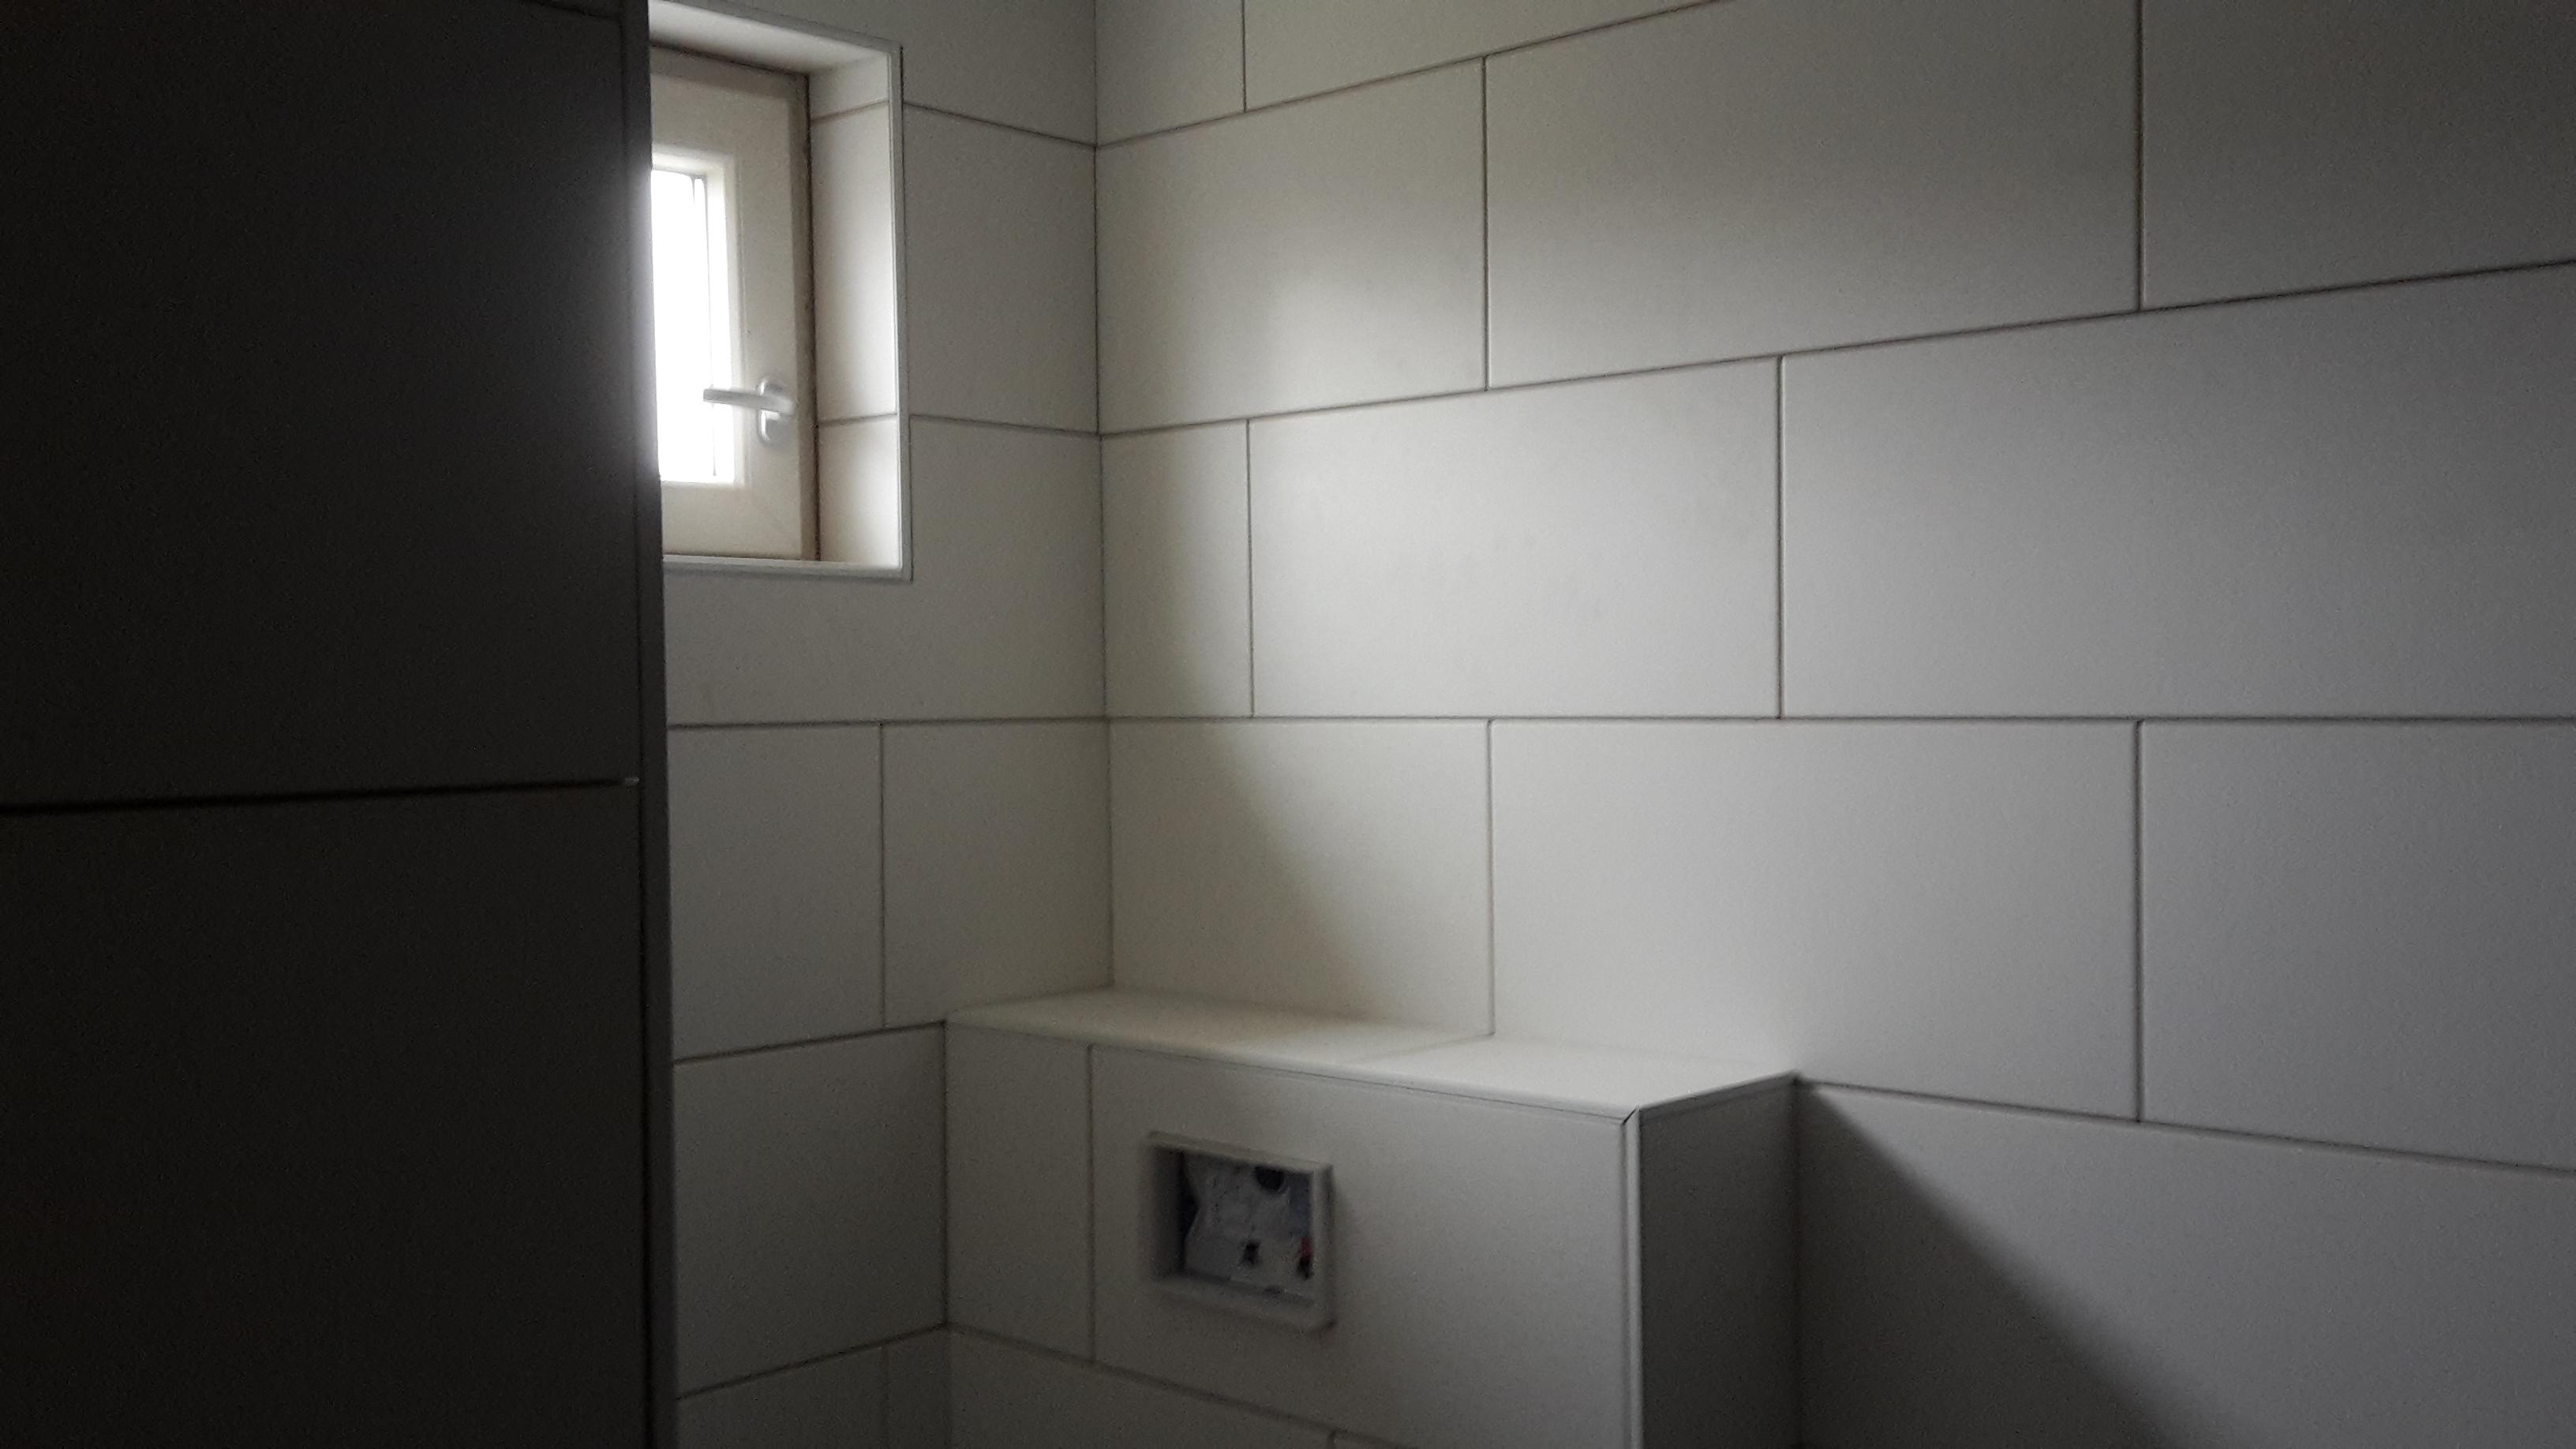 Wildverband Tegels Badkamer : Badkamer leek t. riemersma bouw & onderhoud